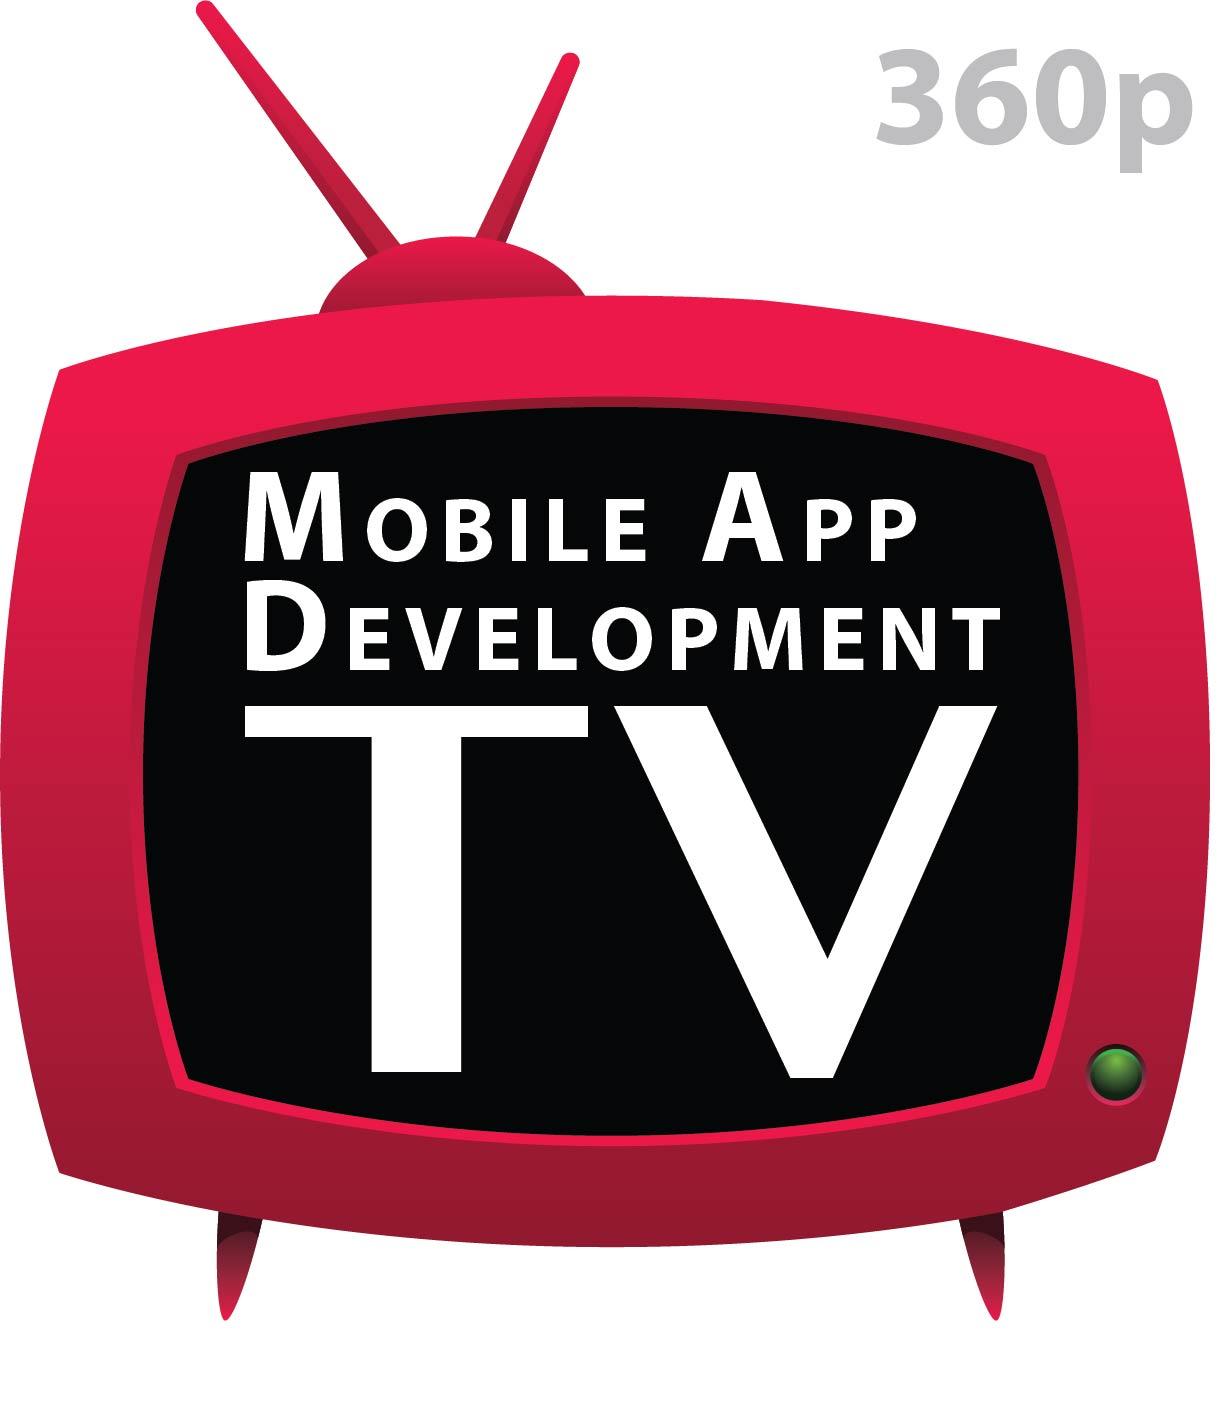 Mobile App Development TV (Video – 360p)